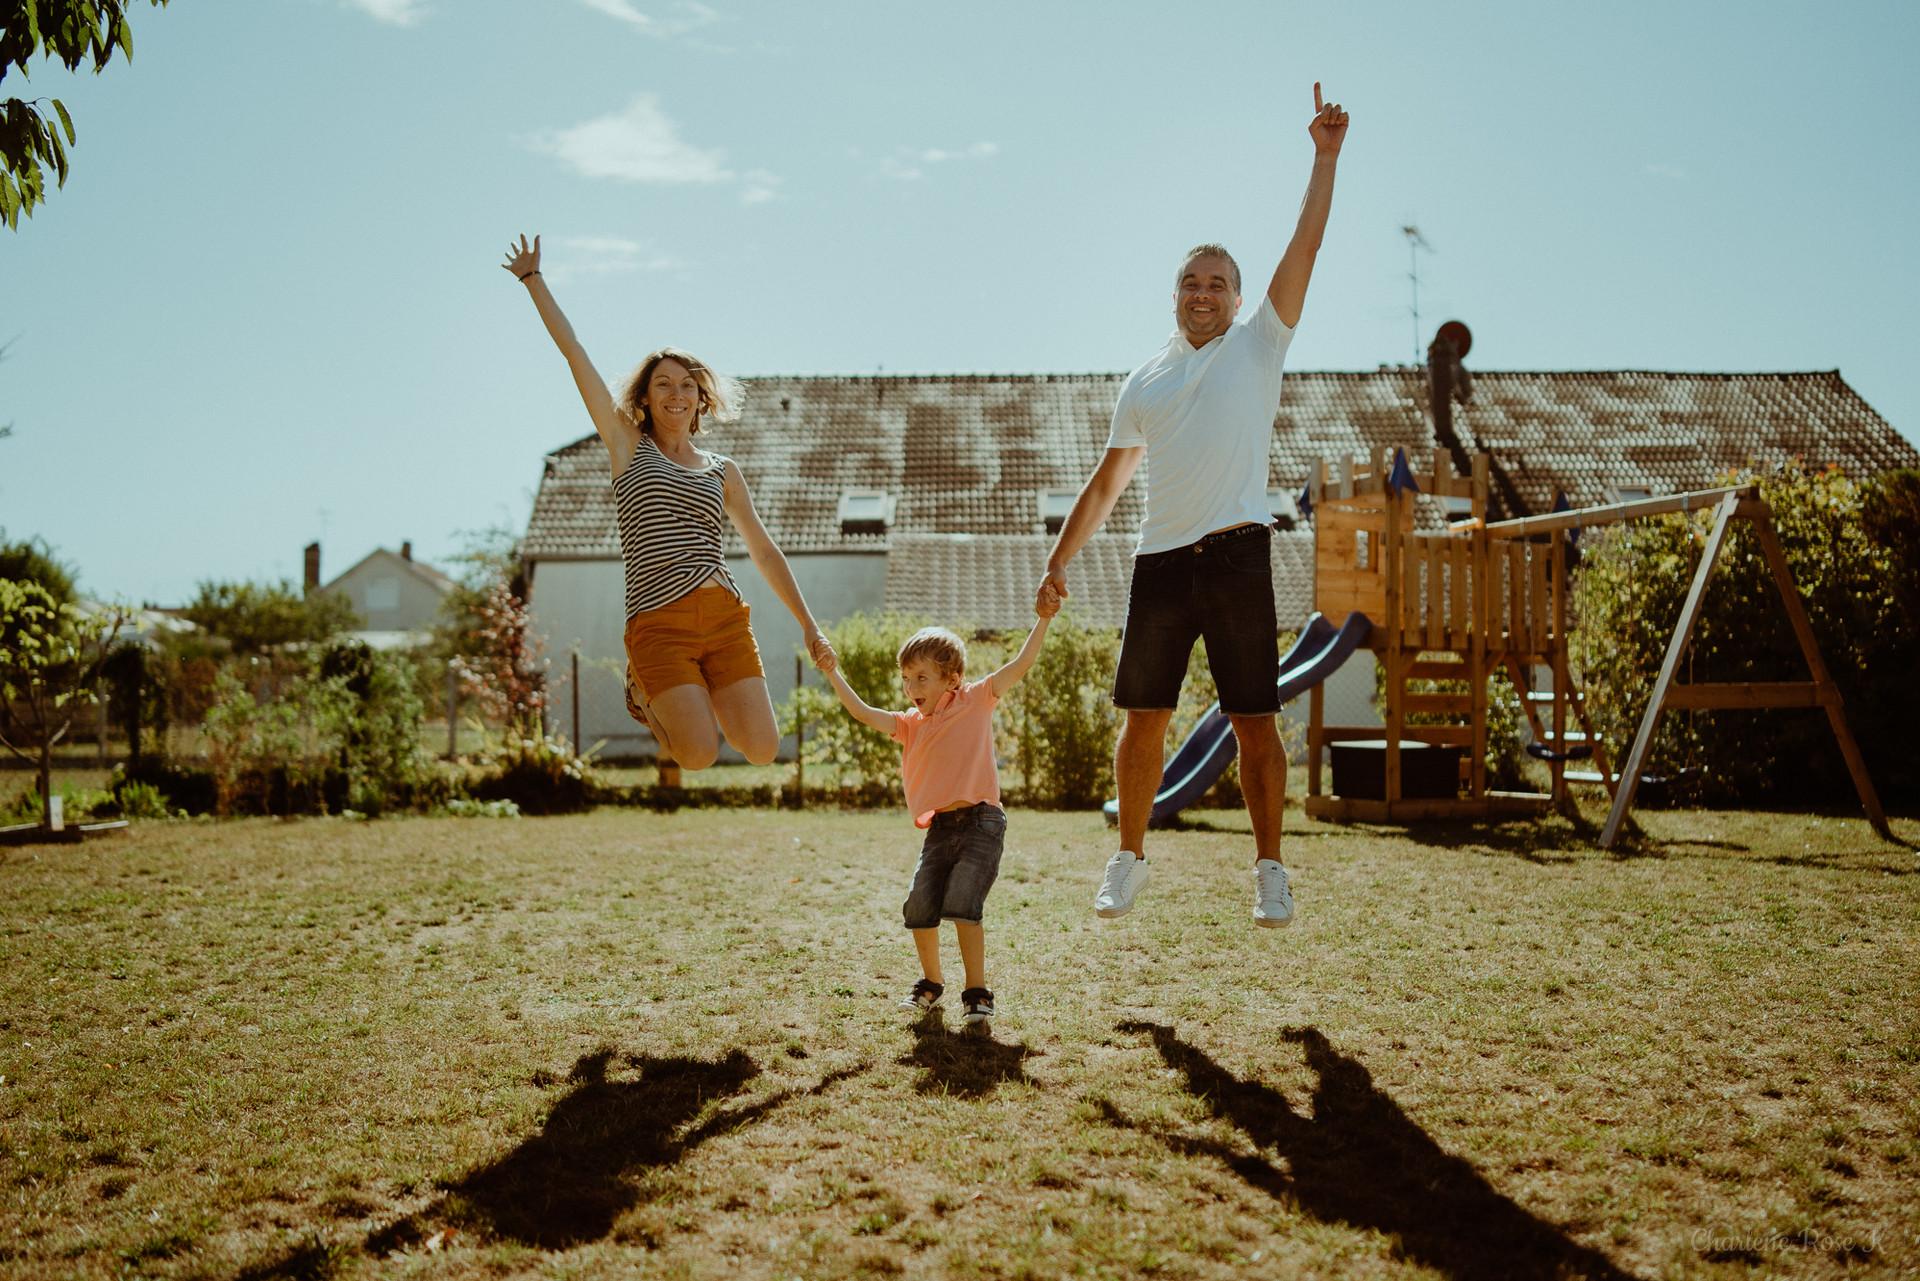 photographe-troyes-famille-enfants-domicile-crk-32